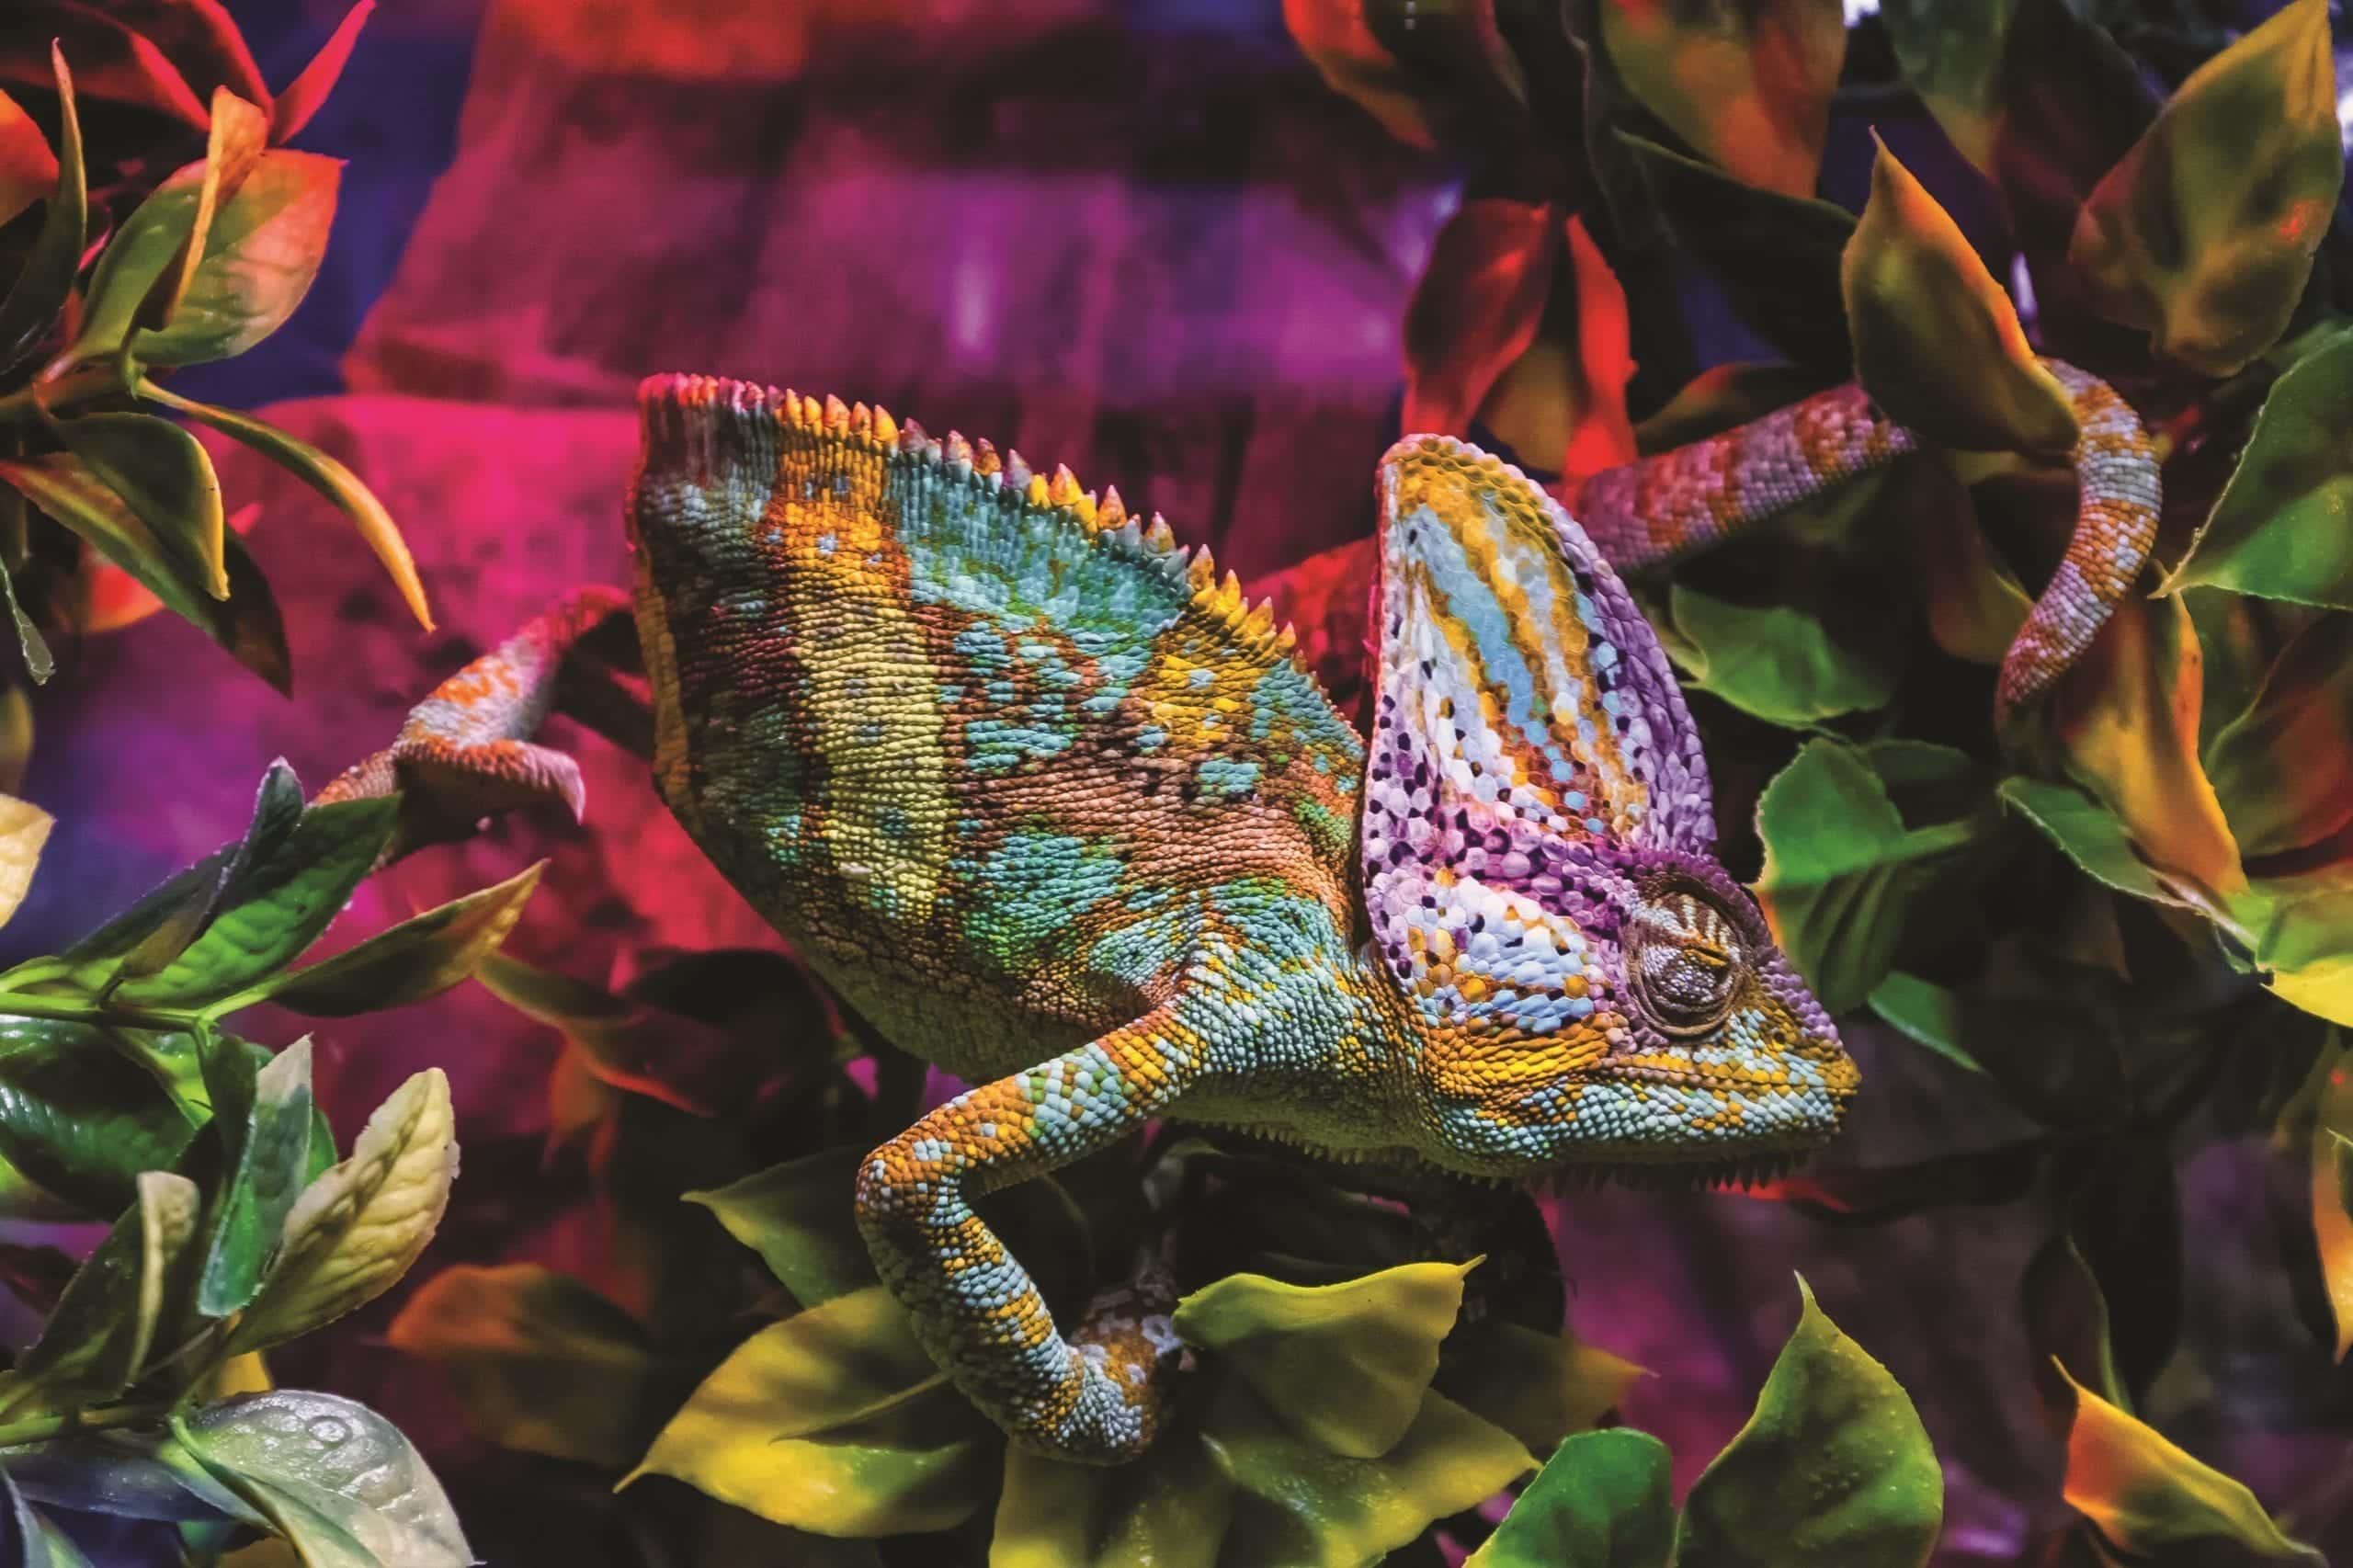 Uzhhorod, Ukraine - March 26, 2017: Chameleon in terrarium during an exhibition of terrarium animals.